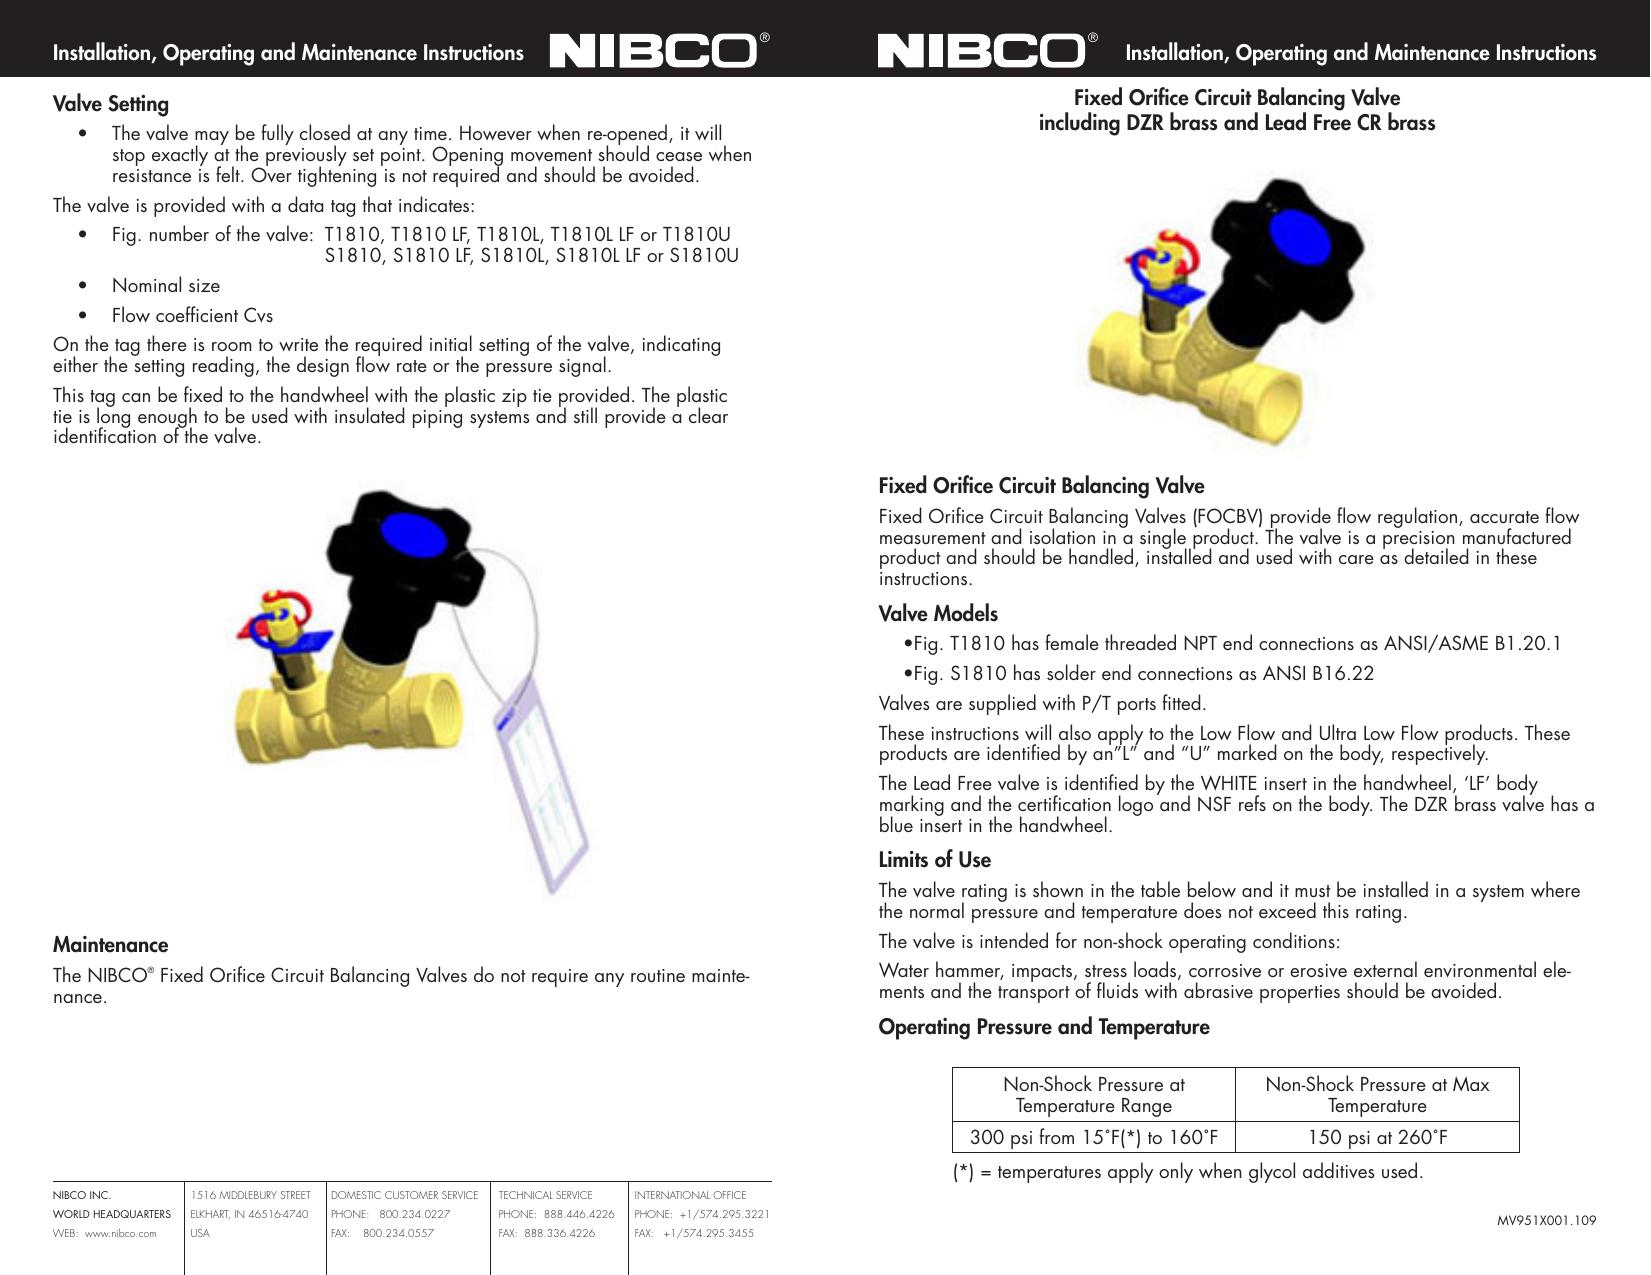 Nibco Erfly Valve Wiring Diagram on